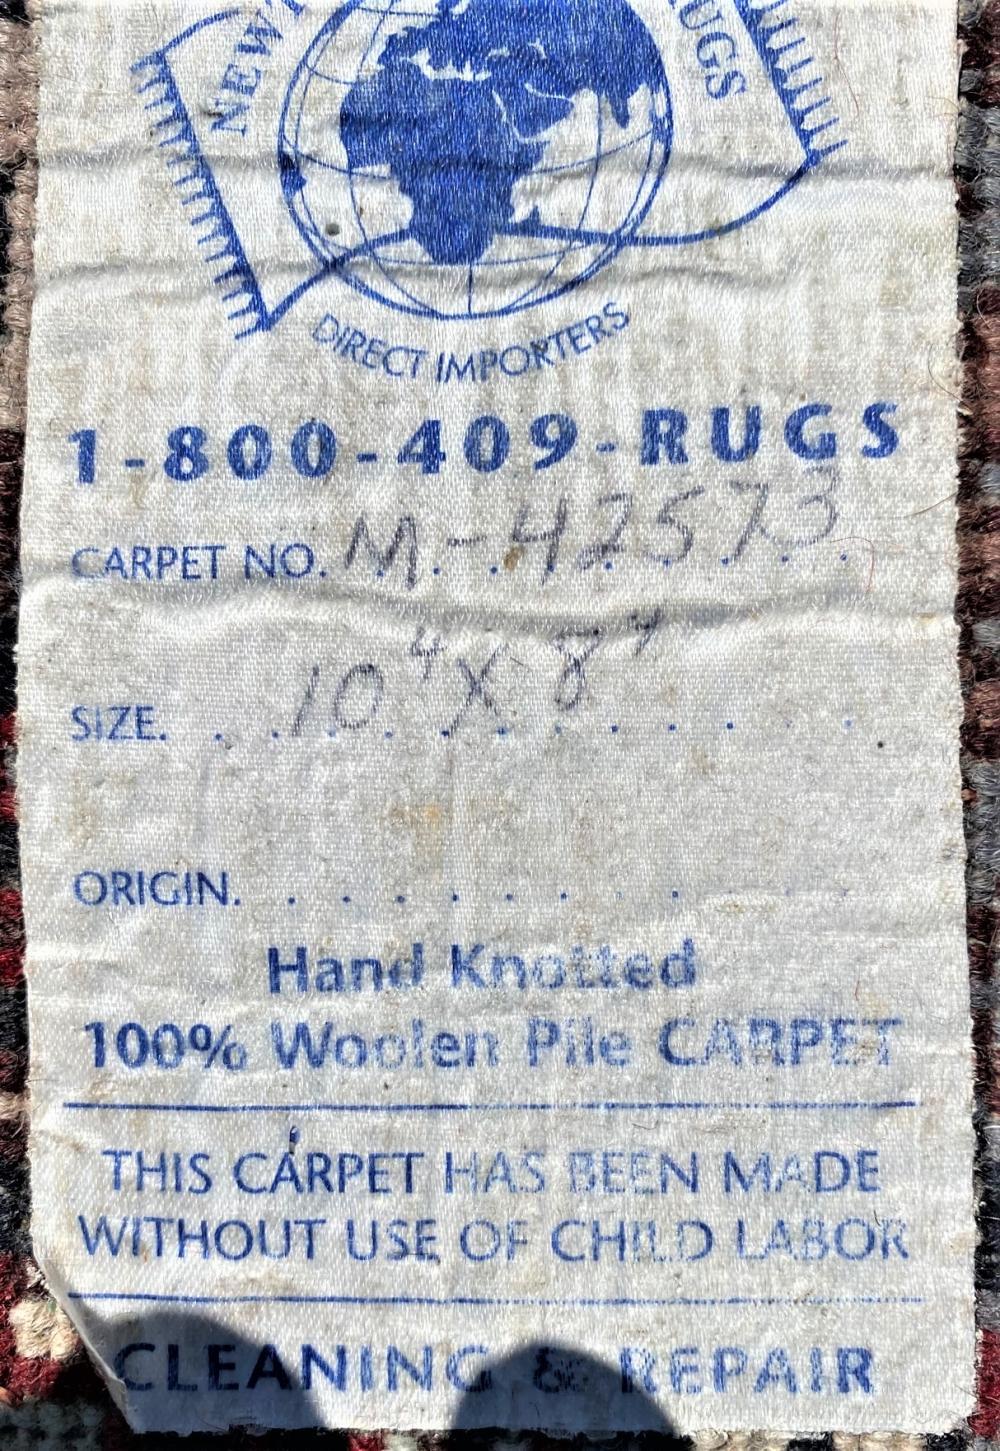 BIDJAR HAND KNOTTED RUG - 8.4 x 10.4